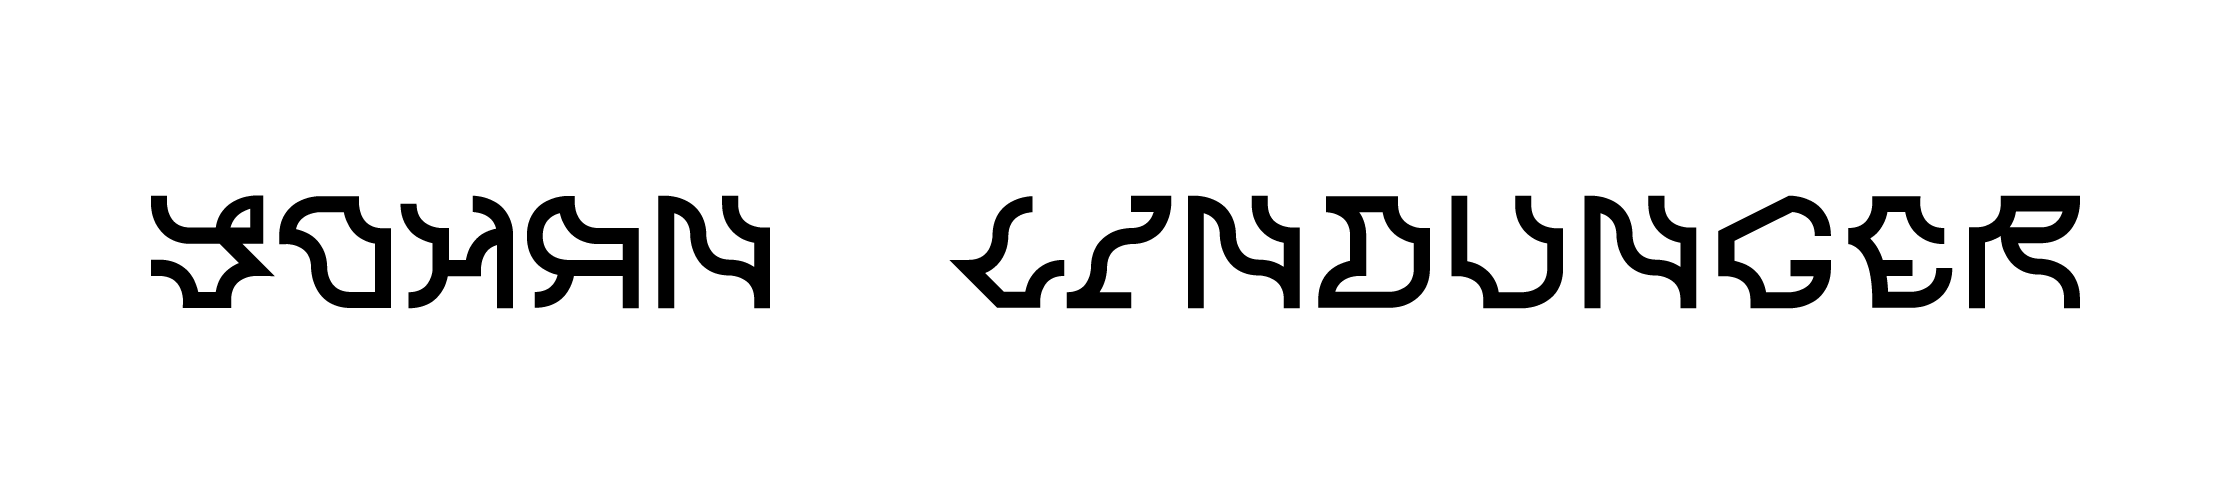 Yohan Lindunger